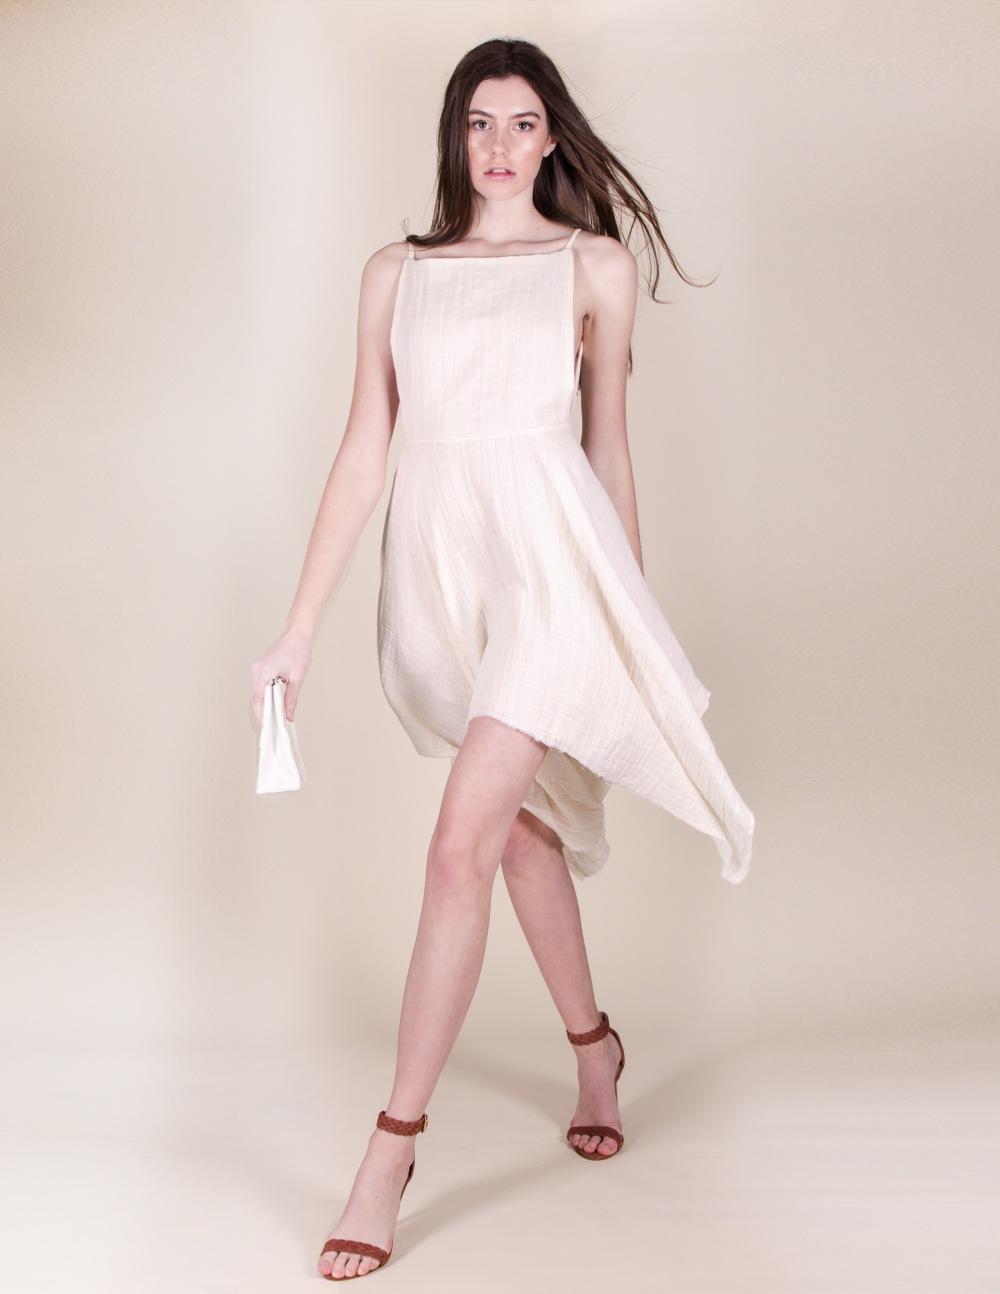 Alyssa Nicole The Karlie Dress 3